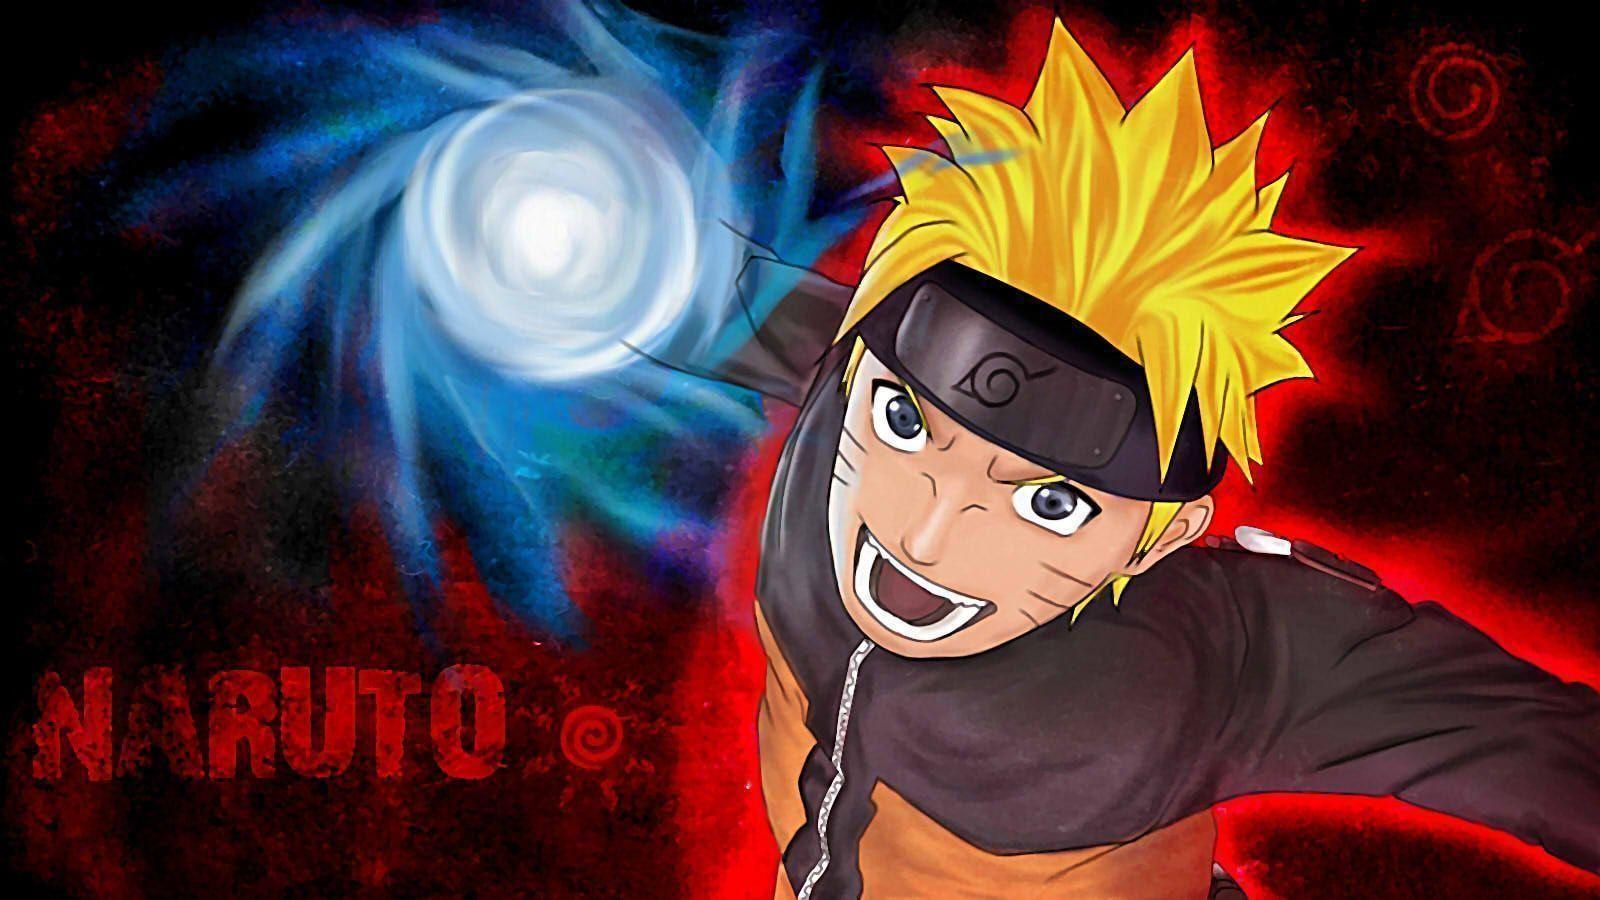 Naruto Rasengan Hd Wallpaper Free Download Naruto Rasengan Wallpapers Wallpaper Cave Naruto Rasengan Wallpape Hd Anime Wallpapers Anime Wallpaper Free Download